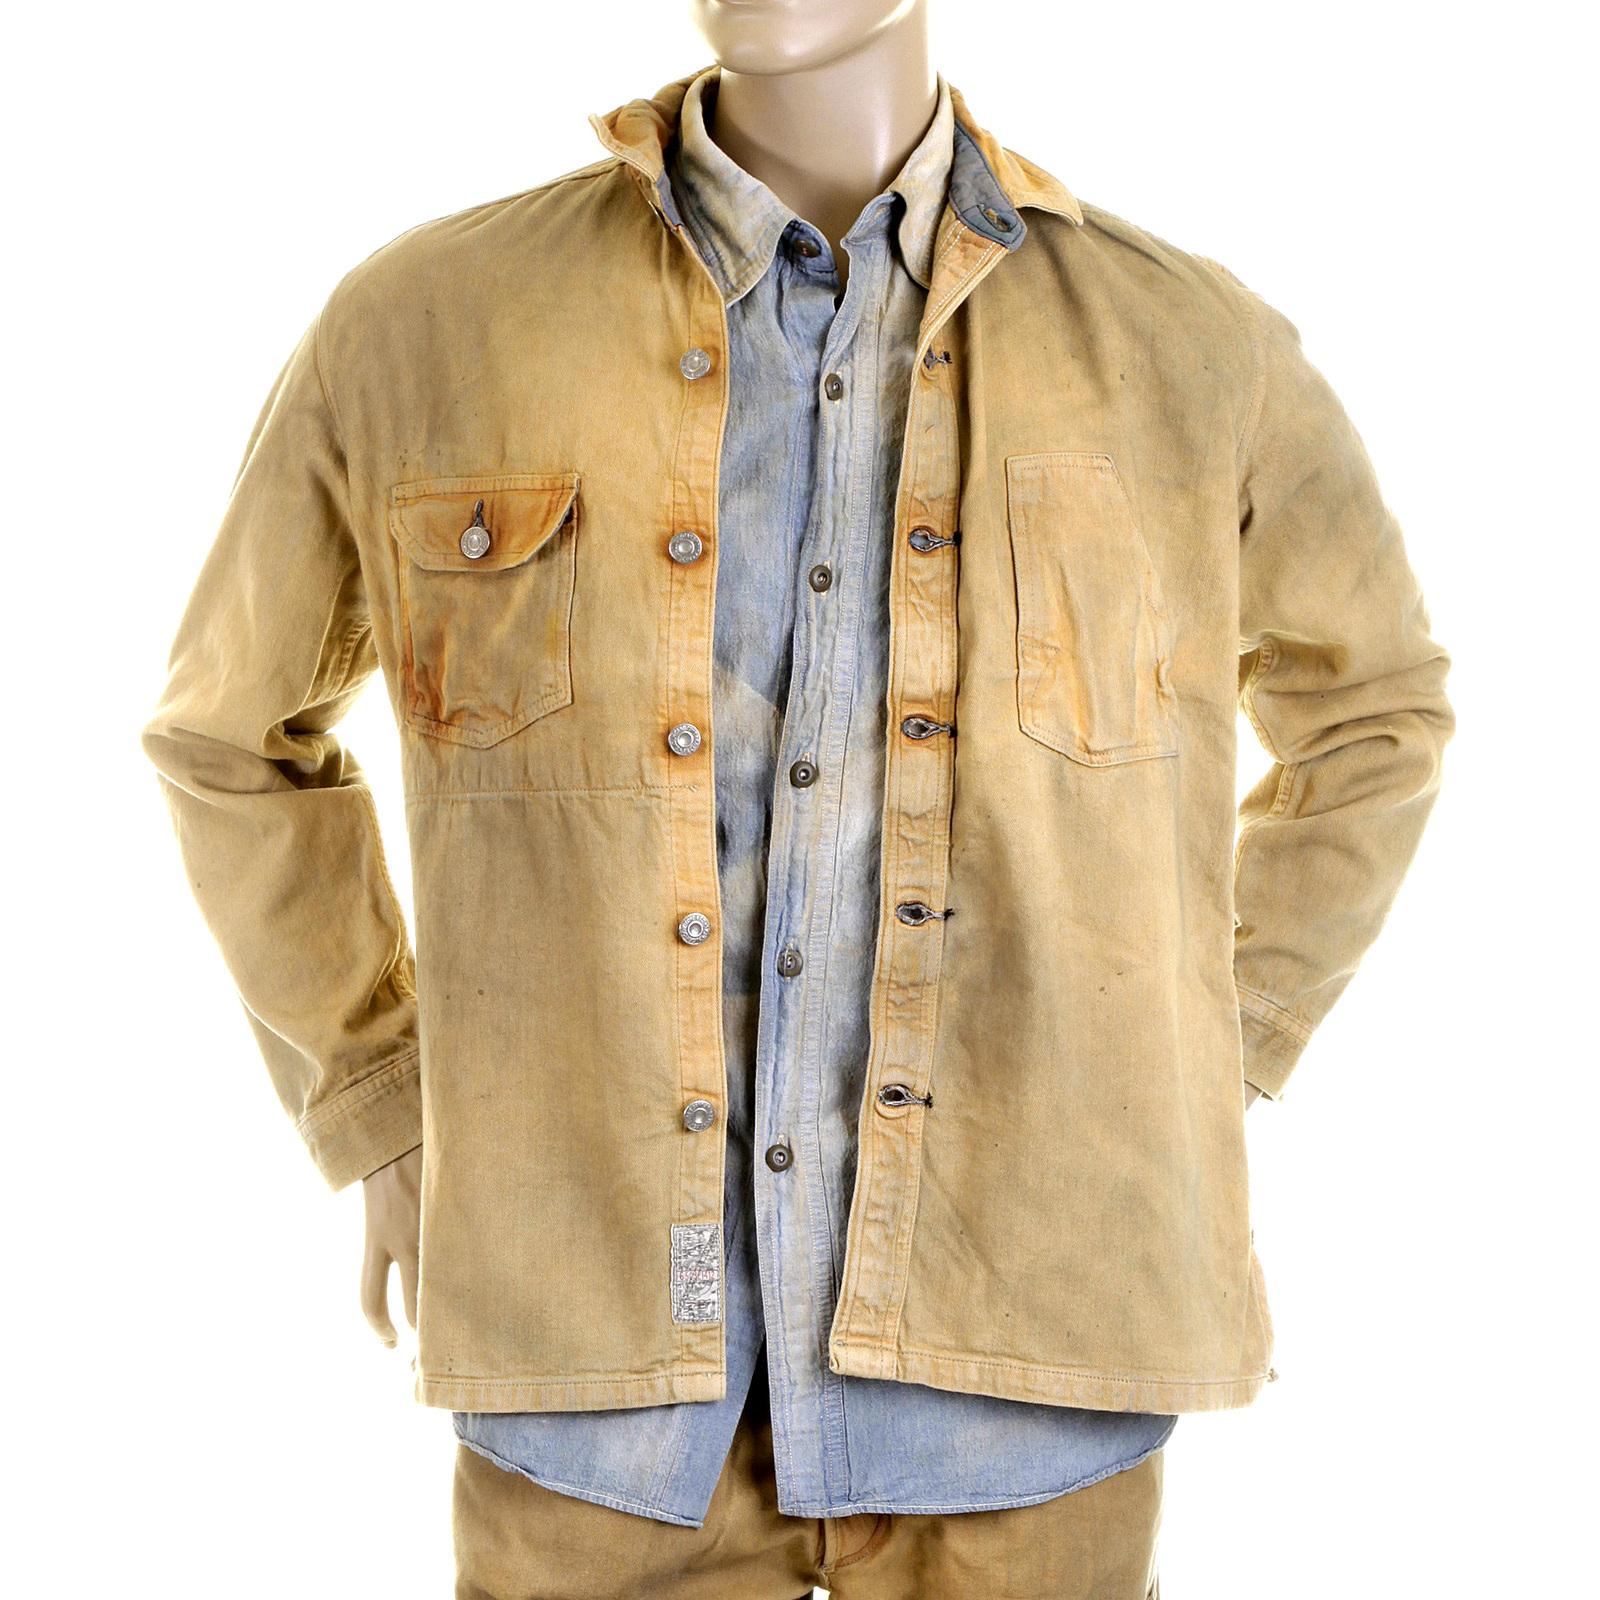 Vintage Workwear 119